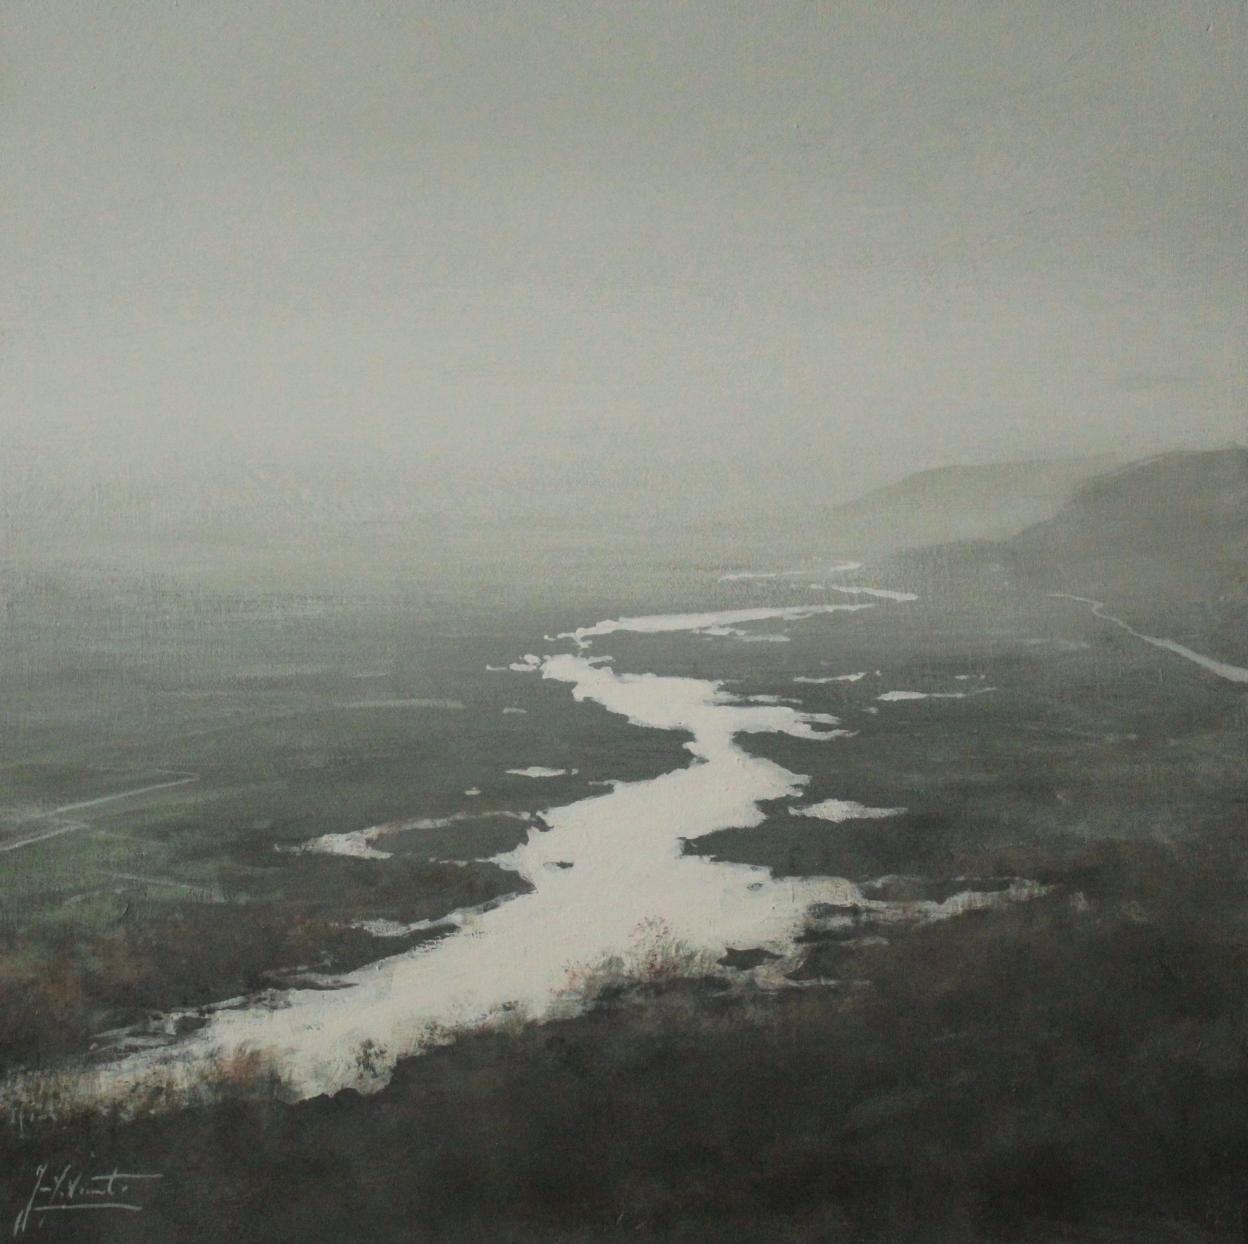 Lagunas (2017) - Juan José Vicente Ramirez